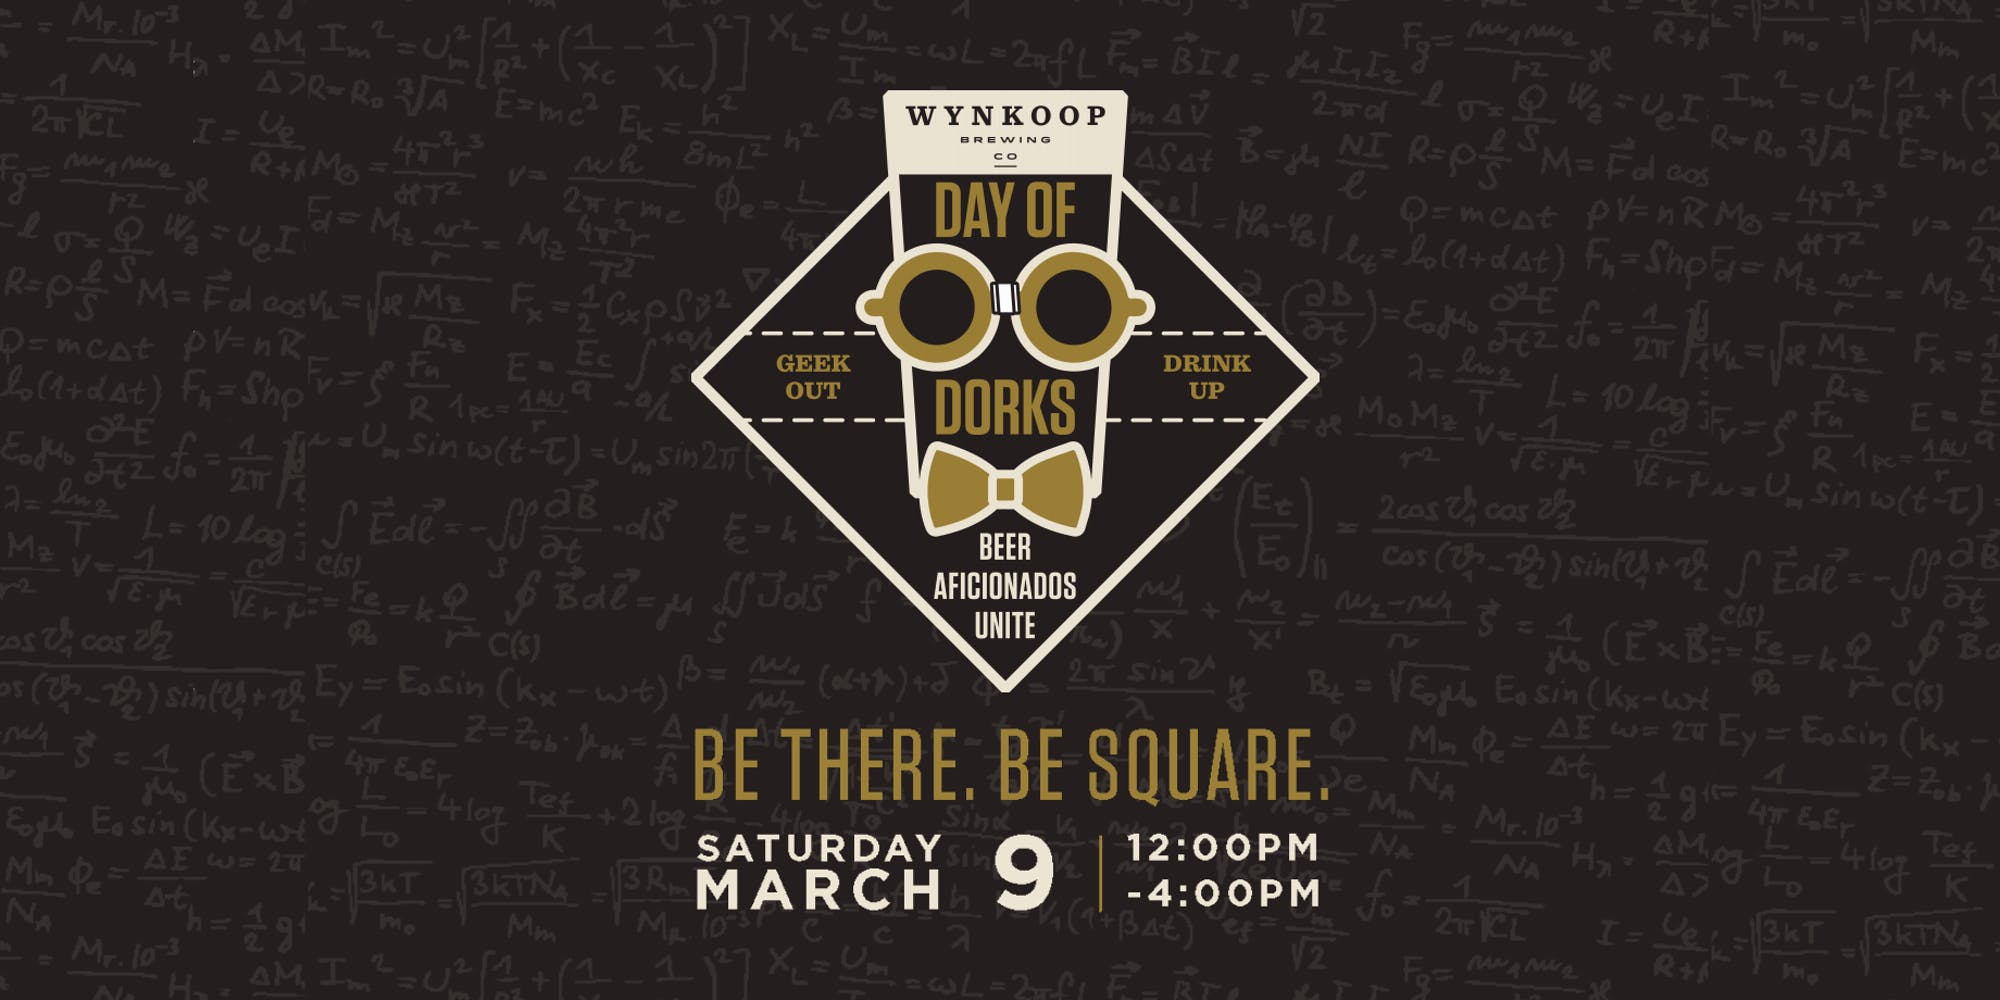 Day of Dorks by Wynkoop Brewing Company